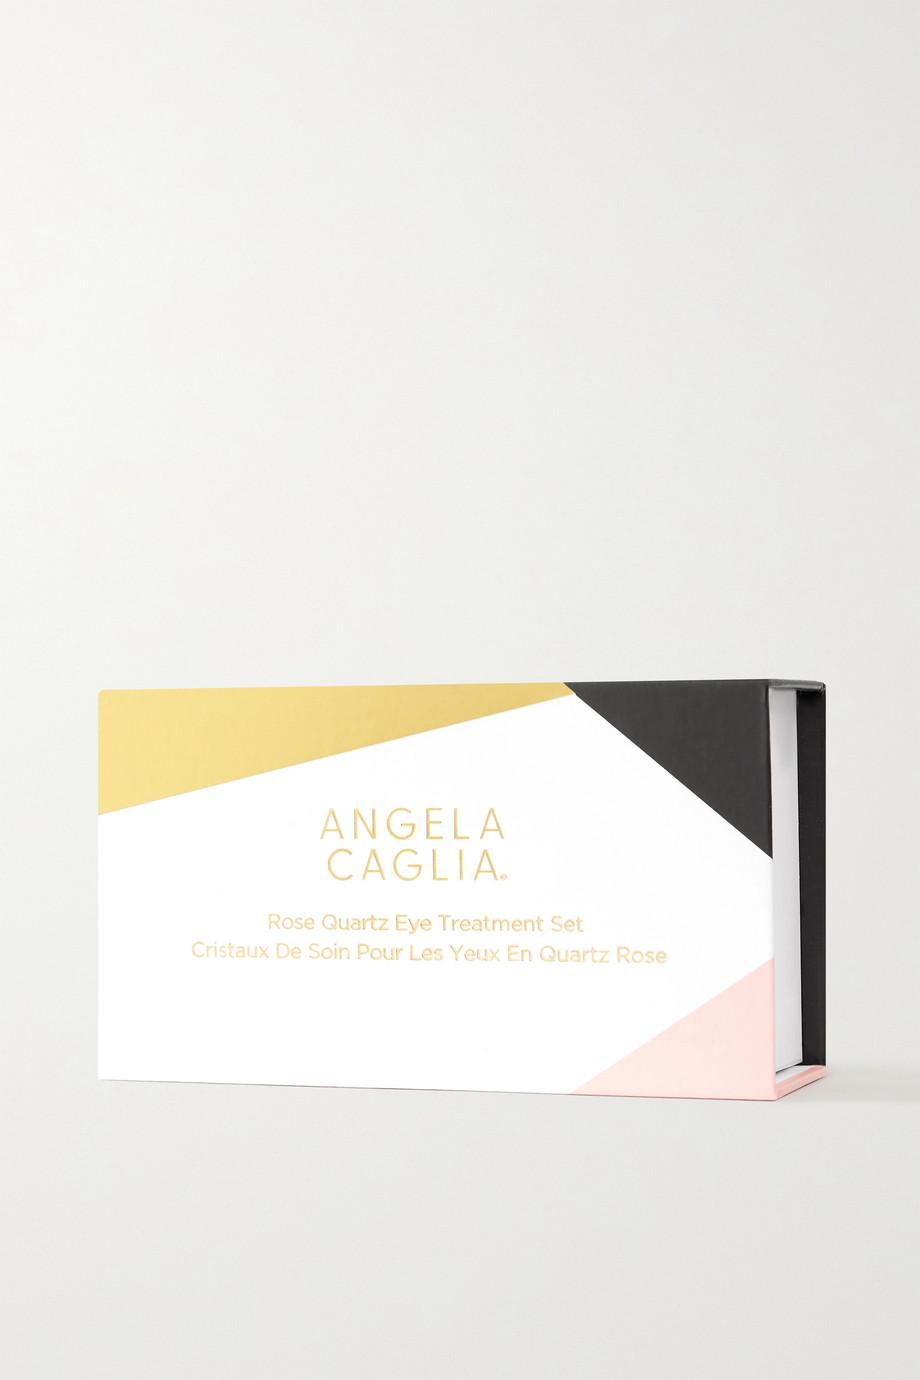 Angela Caglia Rosebud Eye Treatment Set